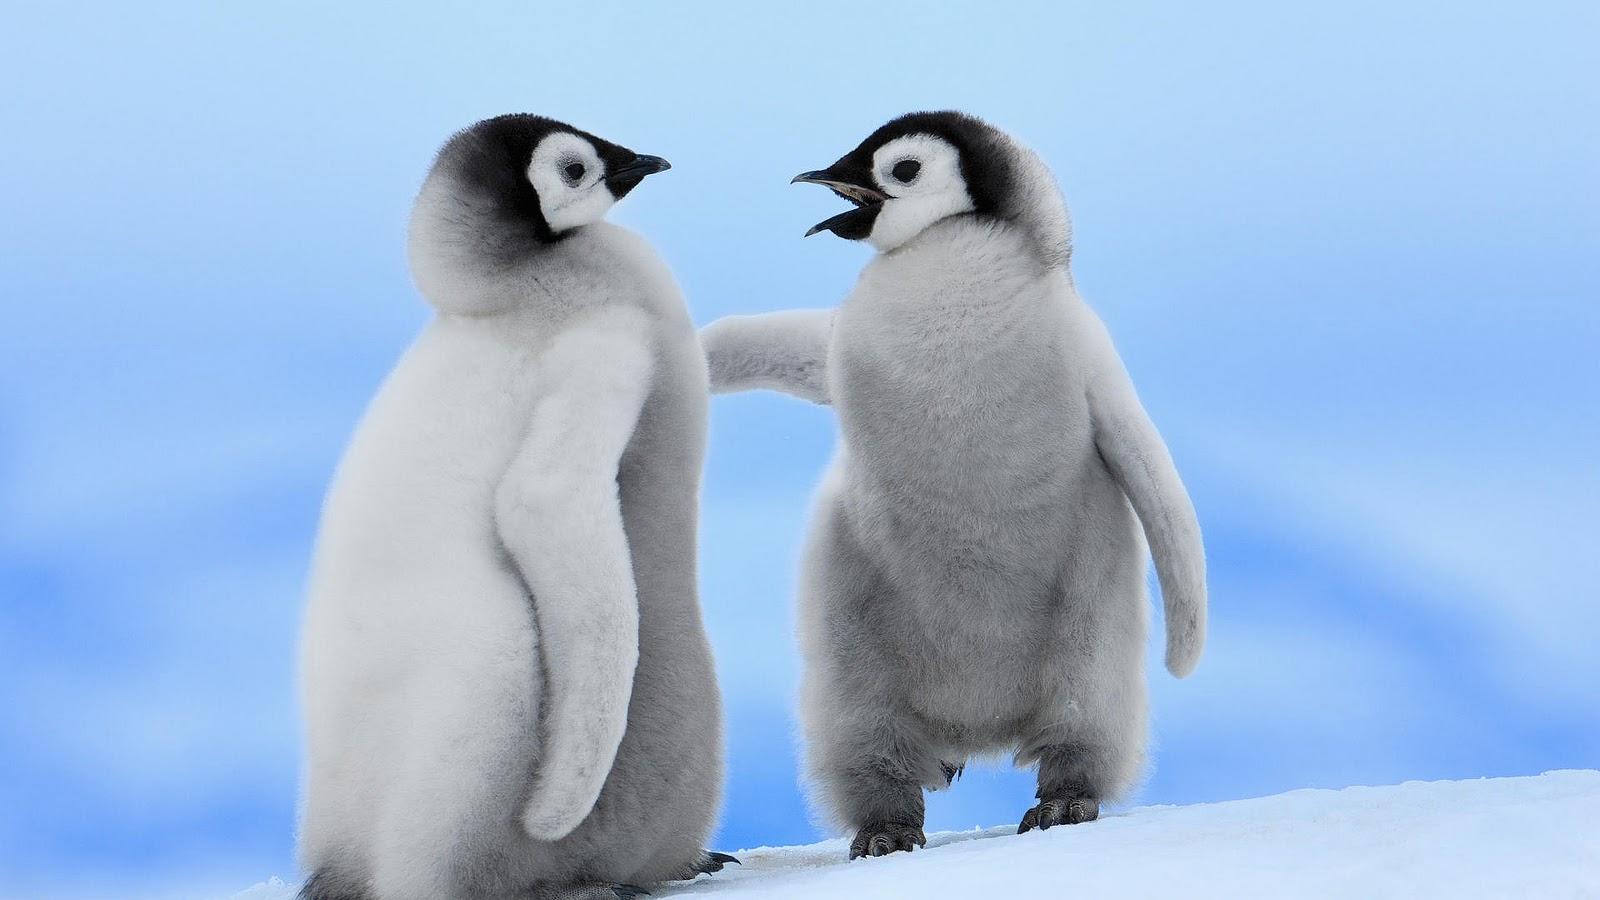 animals hd cute animal nature wallpapers desktop beauty penguin baby penguins pinguin twee google